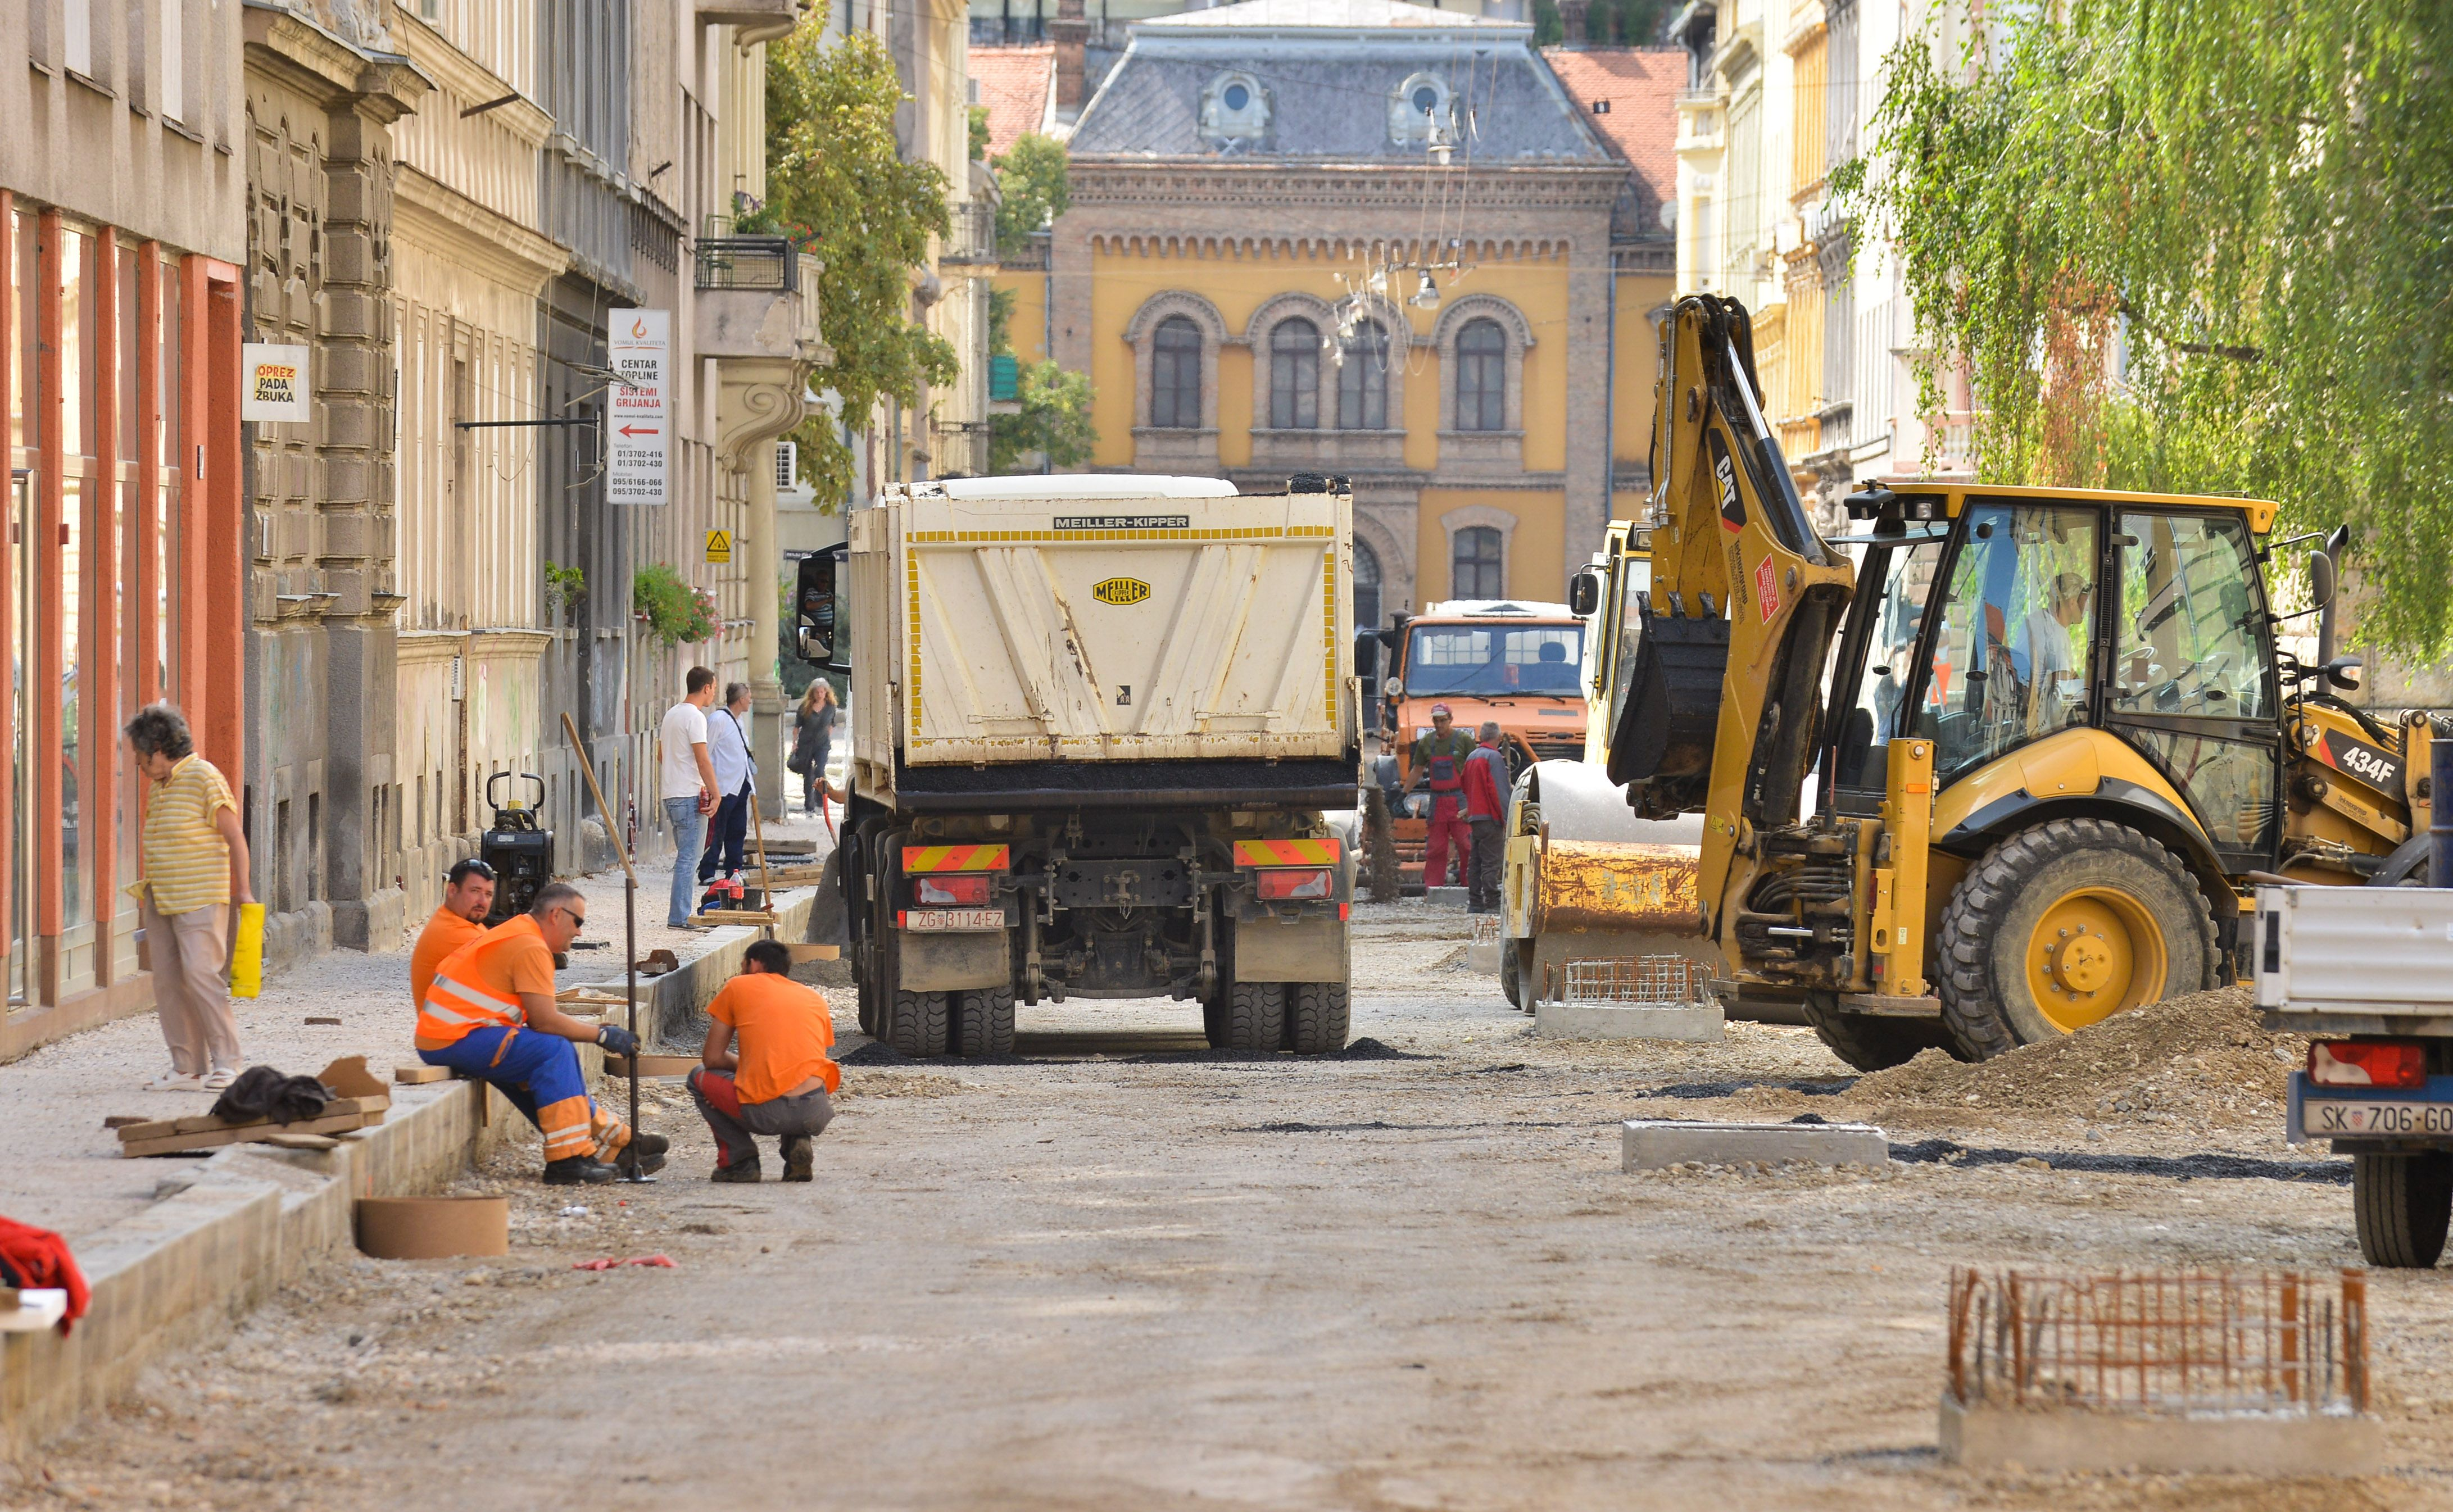 HSLS Radovi u Zagrebu samopromocija gradske vlasti ili rezultat potreba?